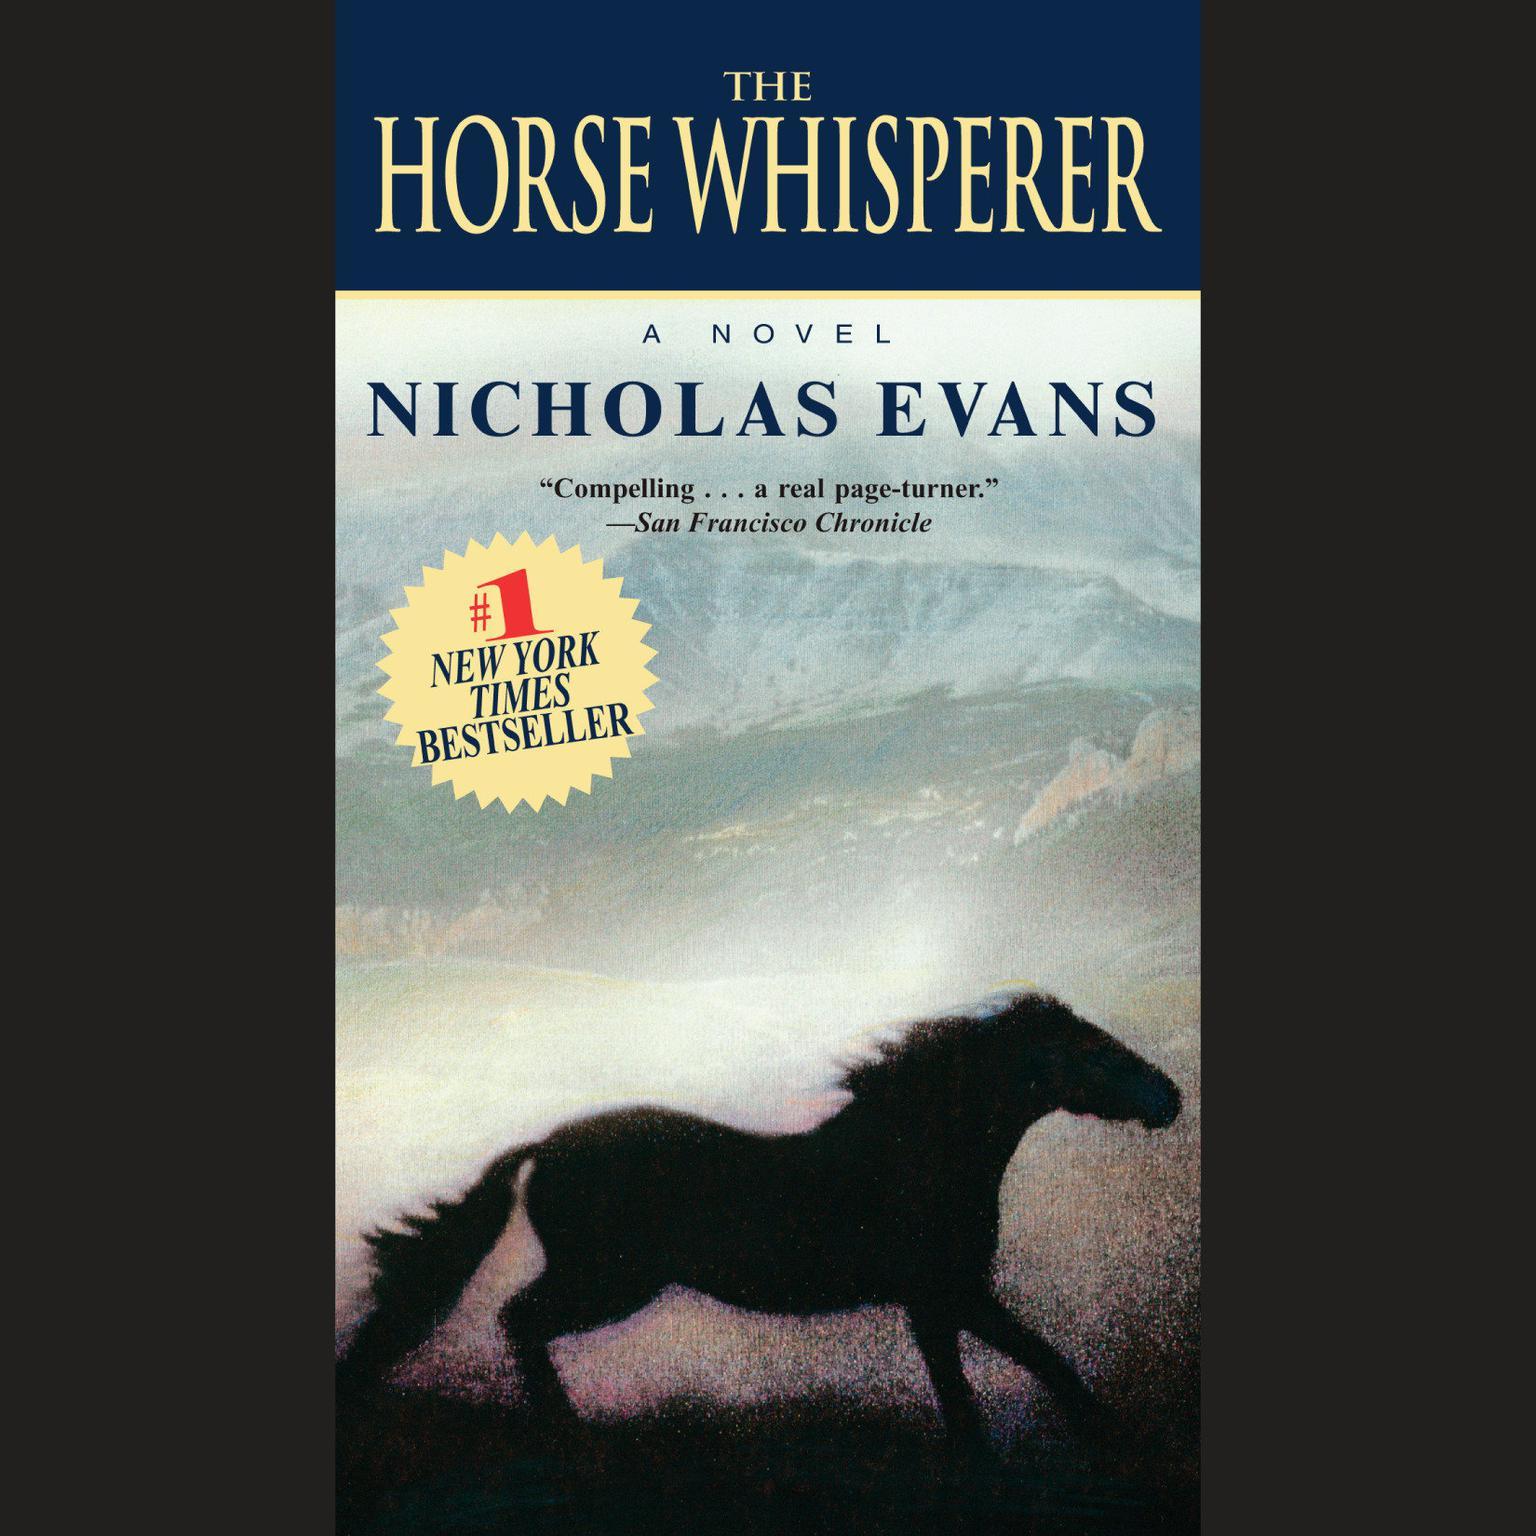 The Horse Whisperer (Abridged): A Novel Audiobook, by Nicholas Evans